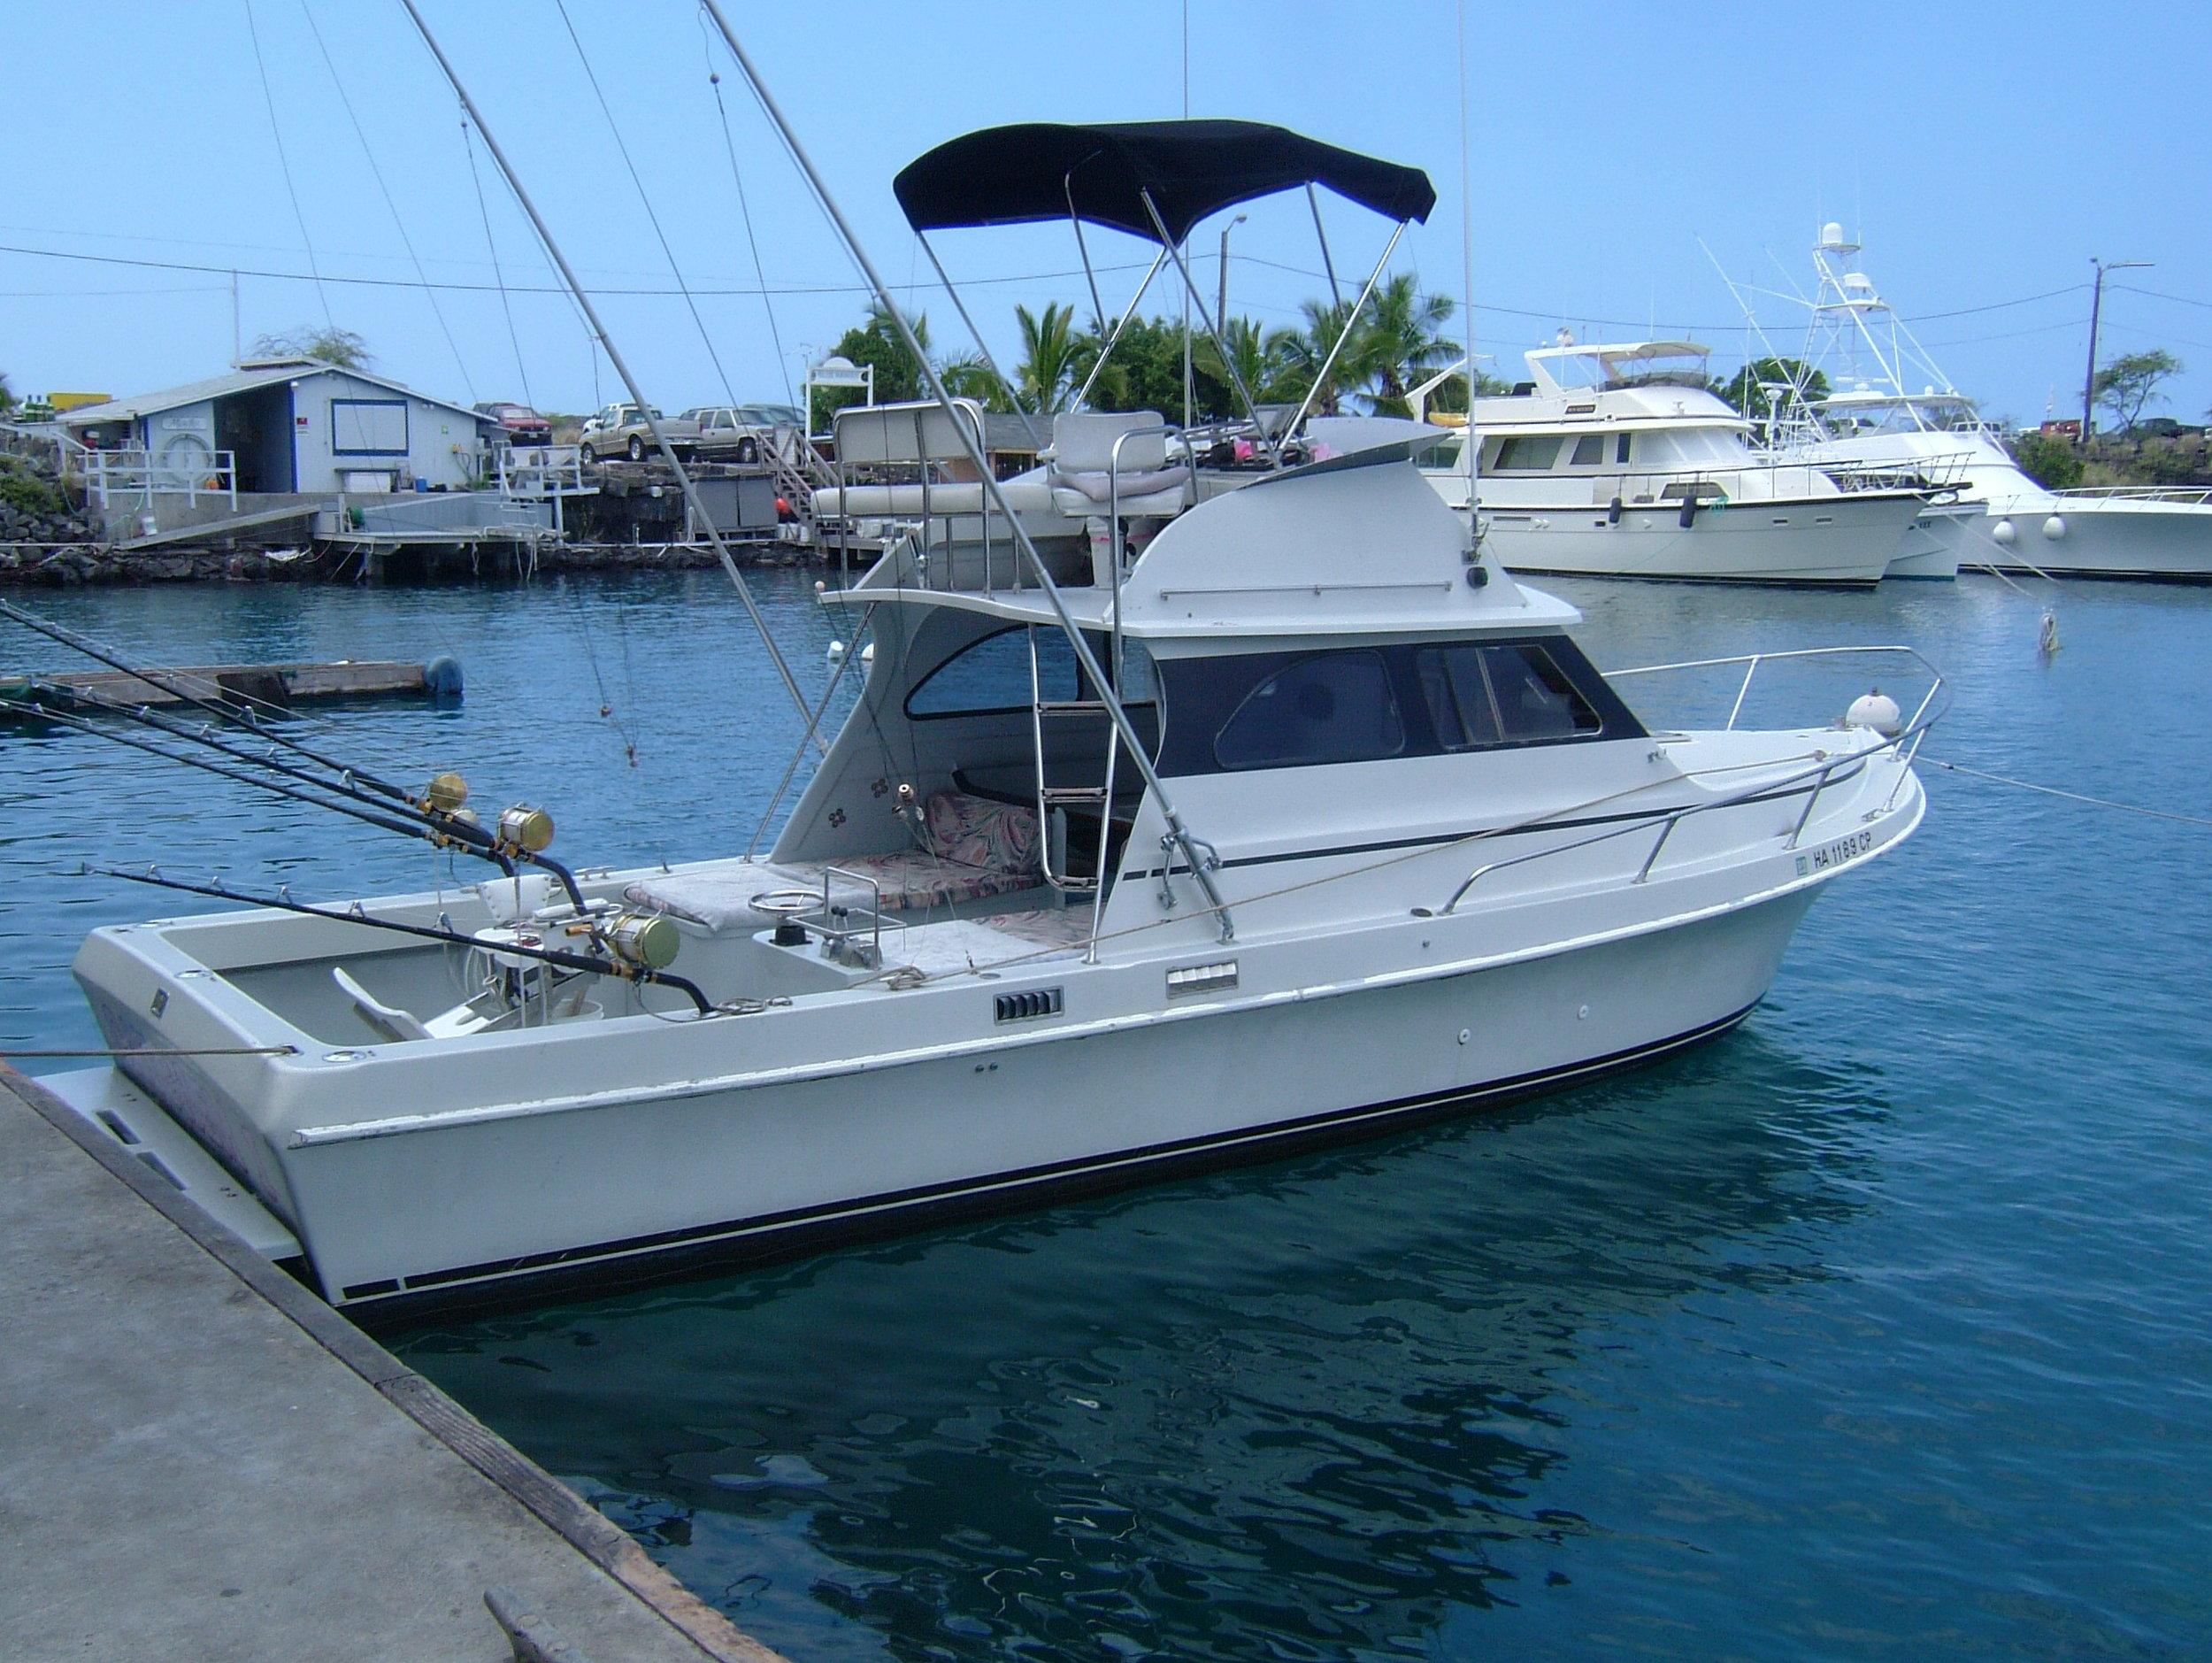 boat7 (1).jpg